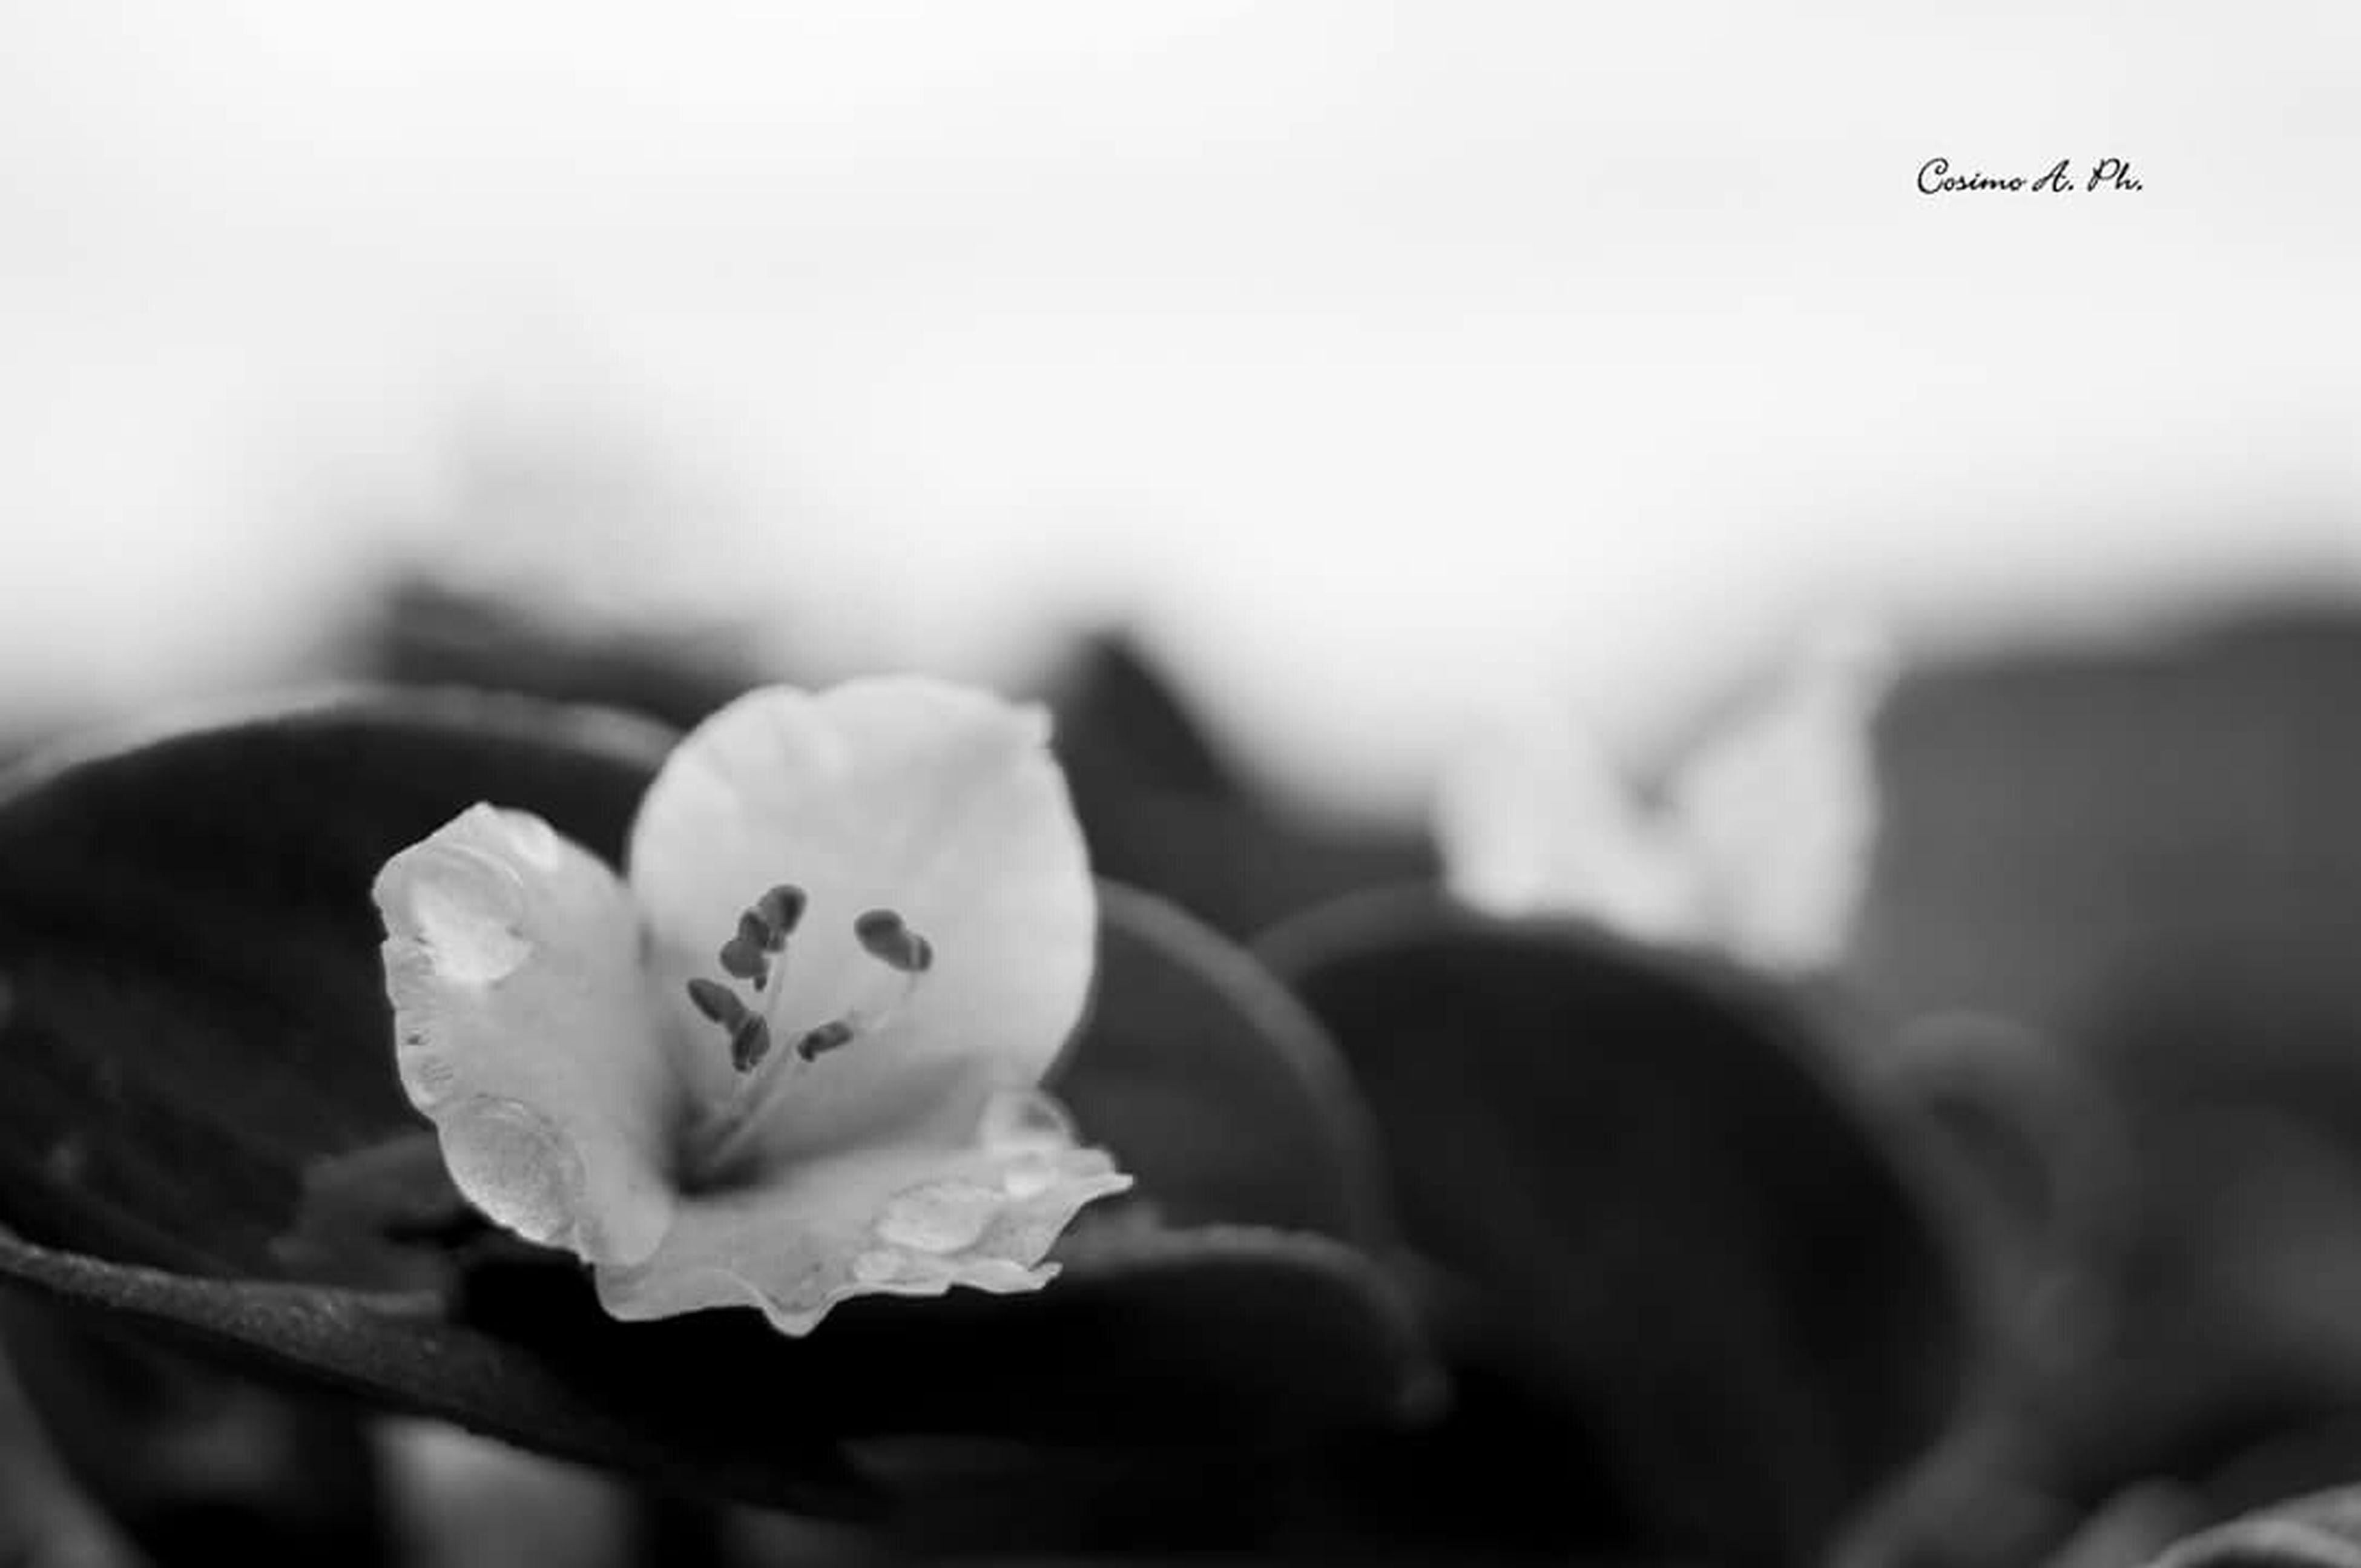 Delicate Delicatessen Delicate Beauty Delicate Flowers Tt_macro_delicatedetails Delicatezza Blackandwhite Black And White Black & White Black&white